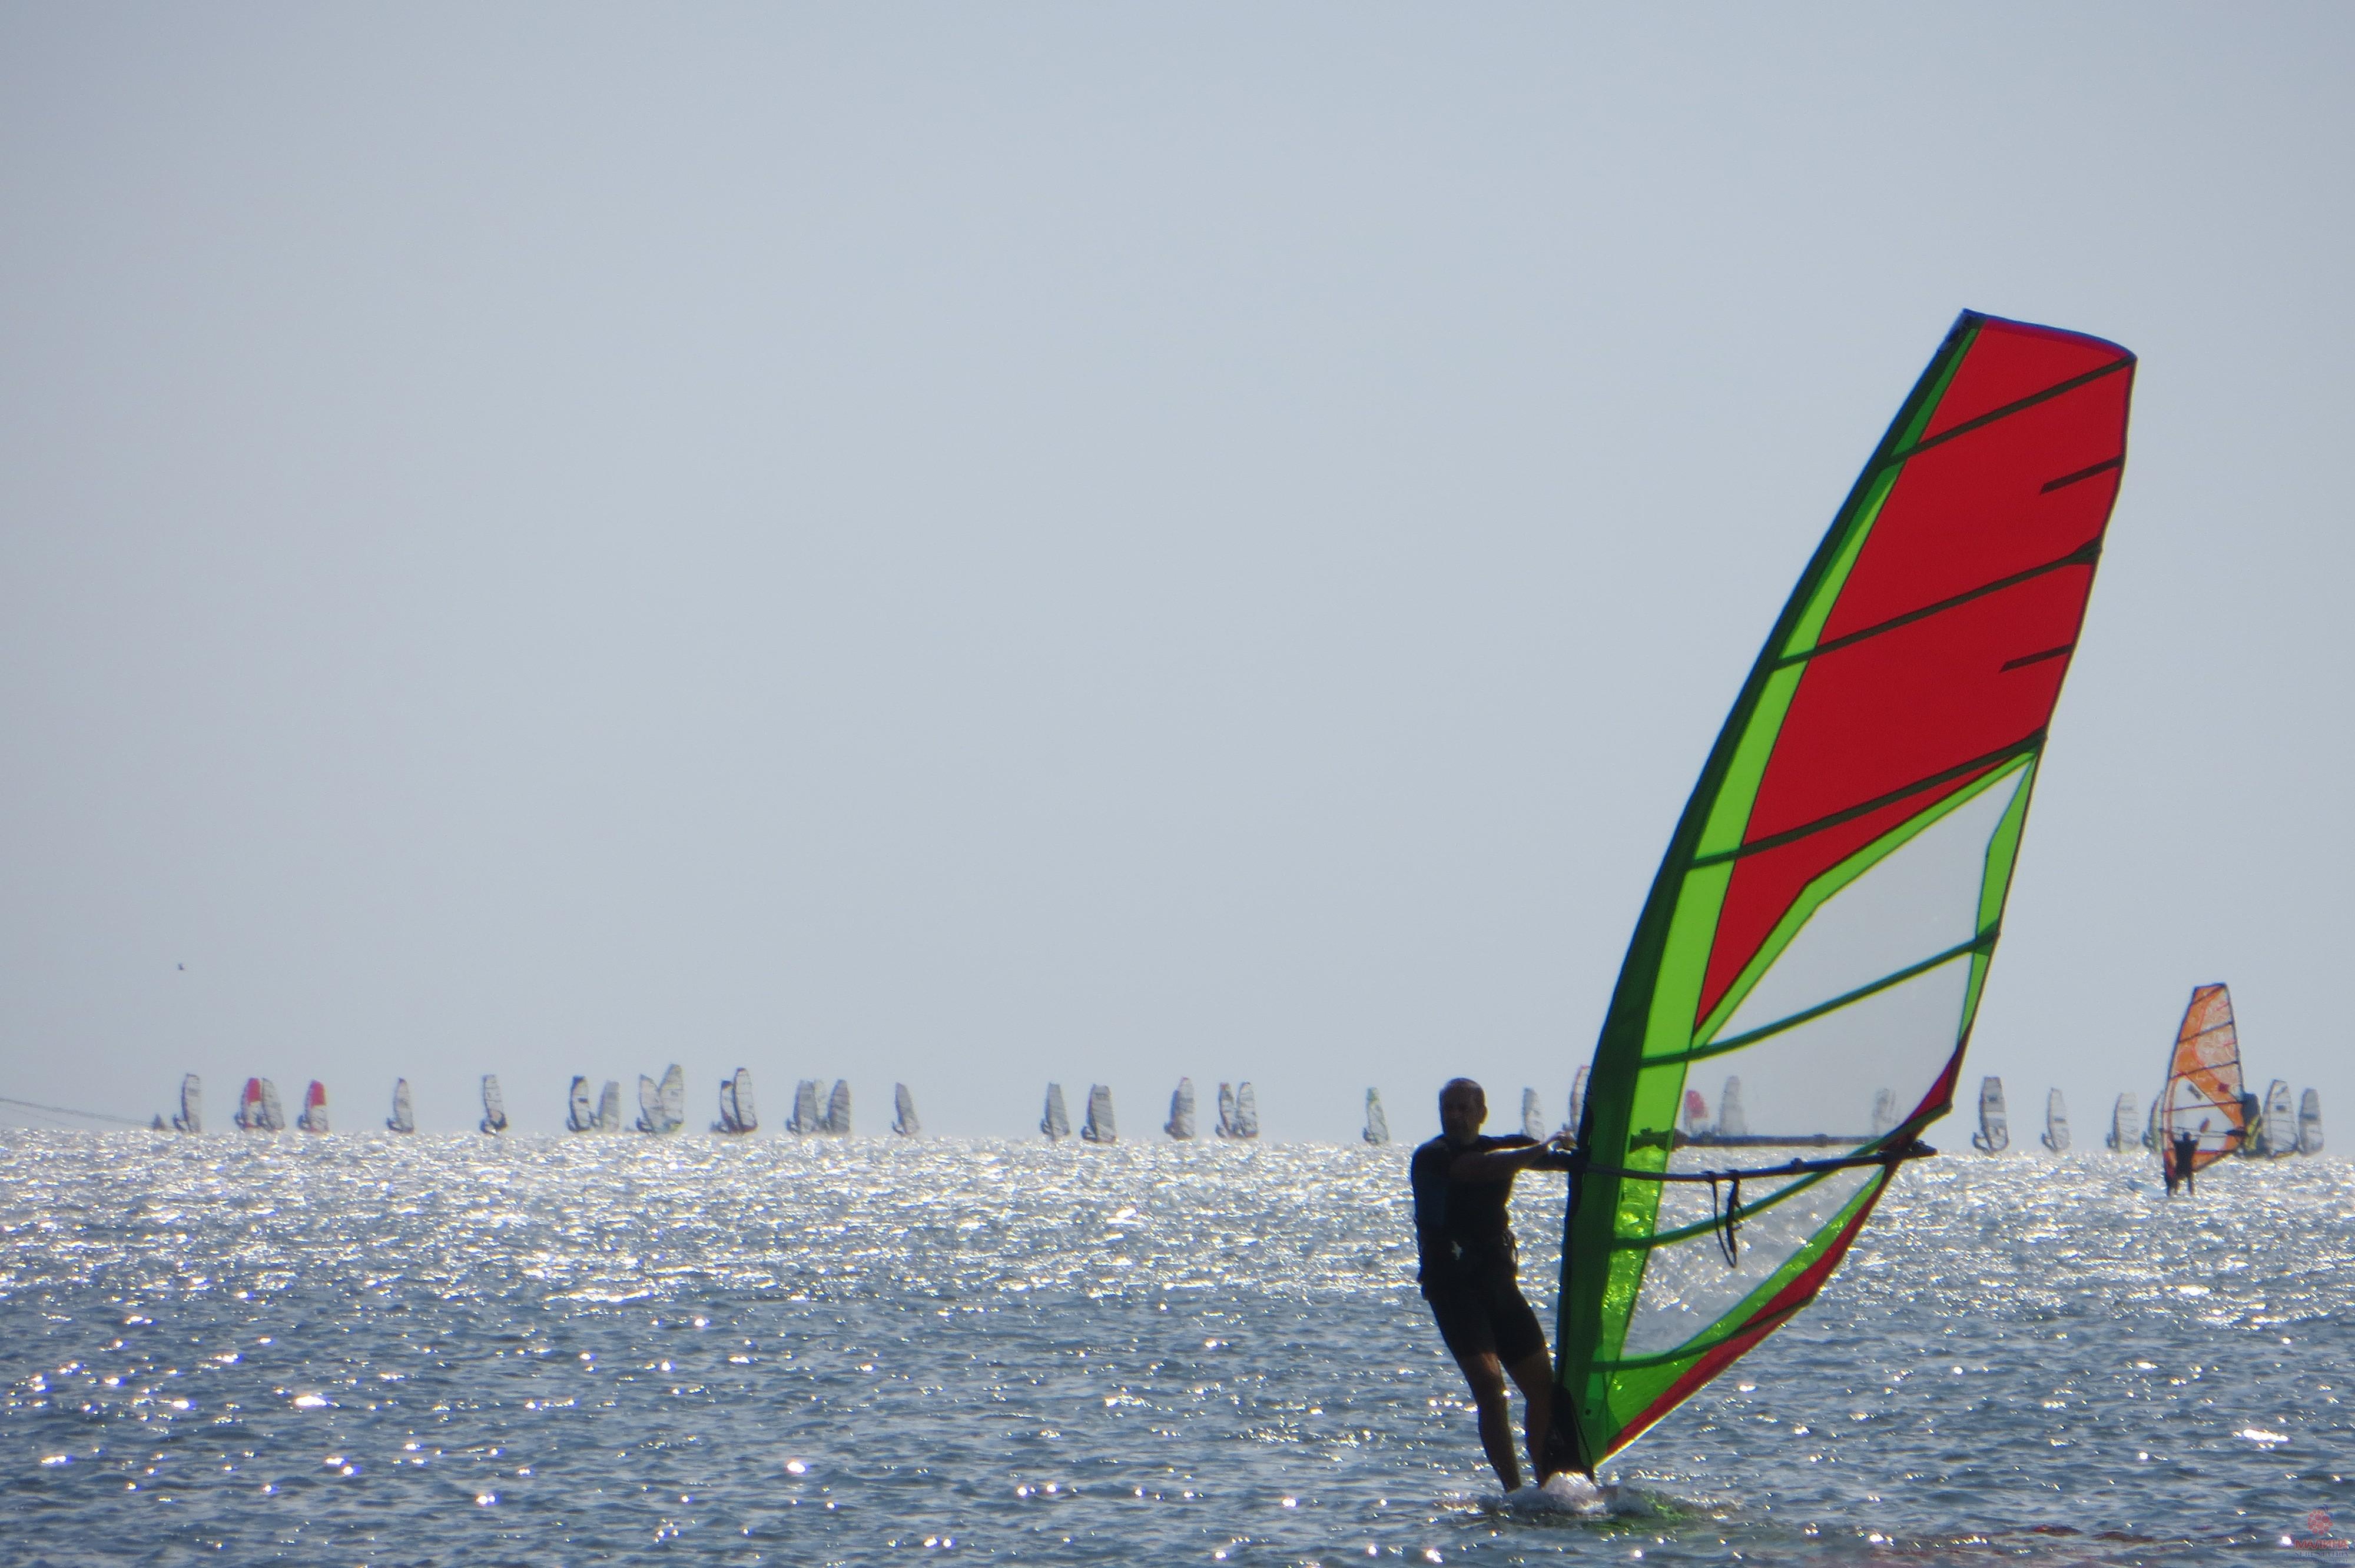 http://malinasport.ru/uploads/posts/2017-03/1488580354_dolzhanskaya_kite_wind_surf_15.jpg